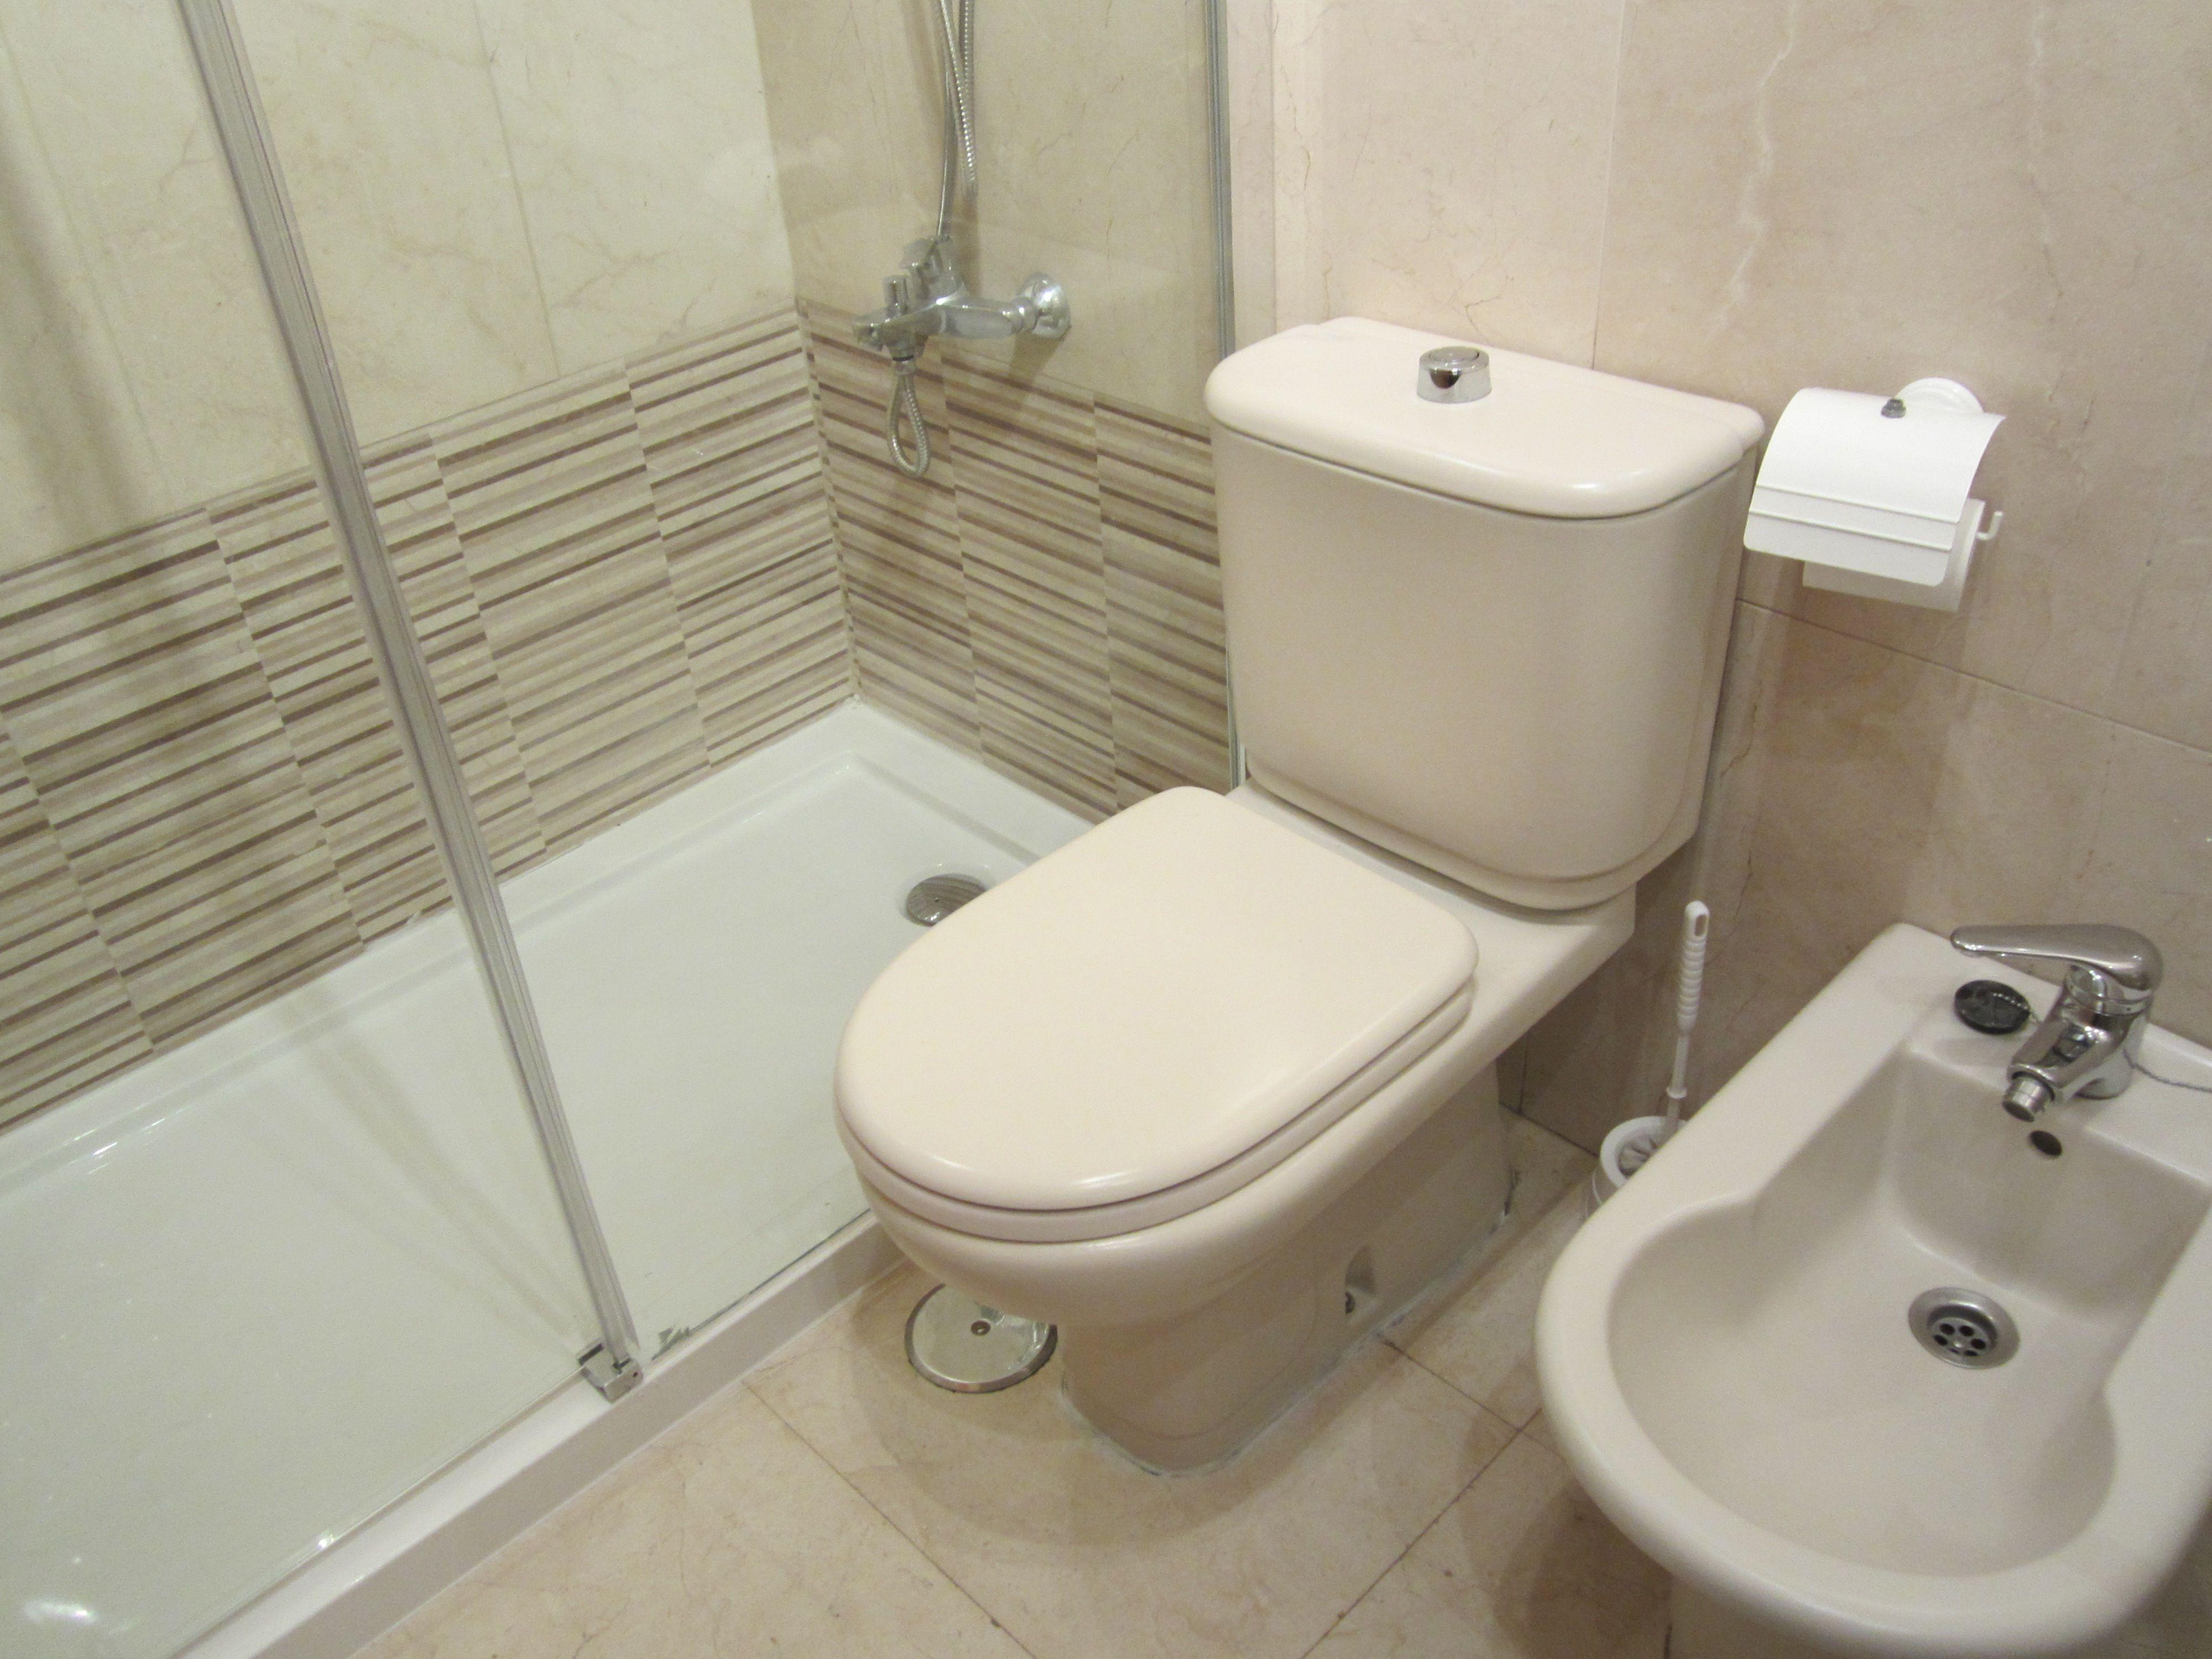 estudio mg - madrid - 29 m2 útiles - baño 3 m2 - sustitución de, Badezimmer ideen